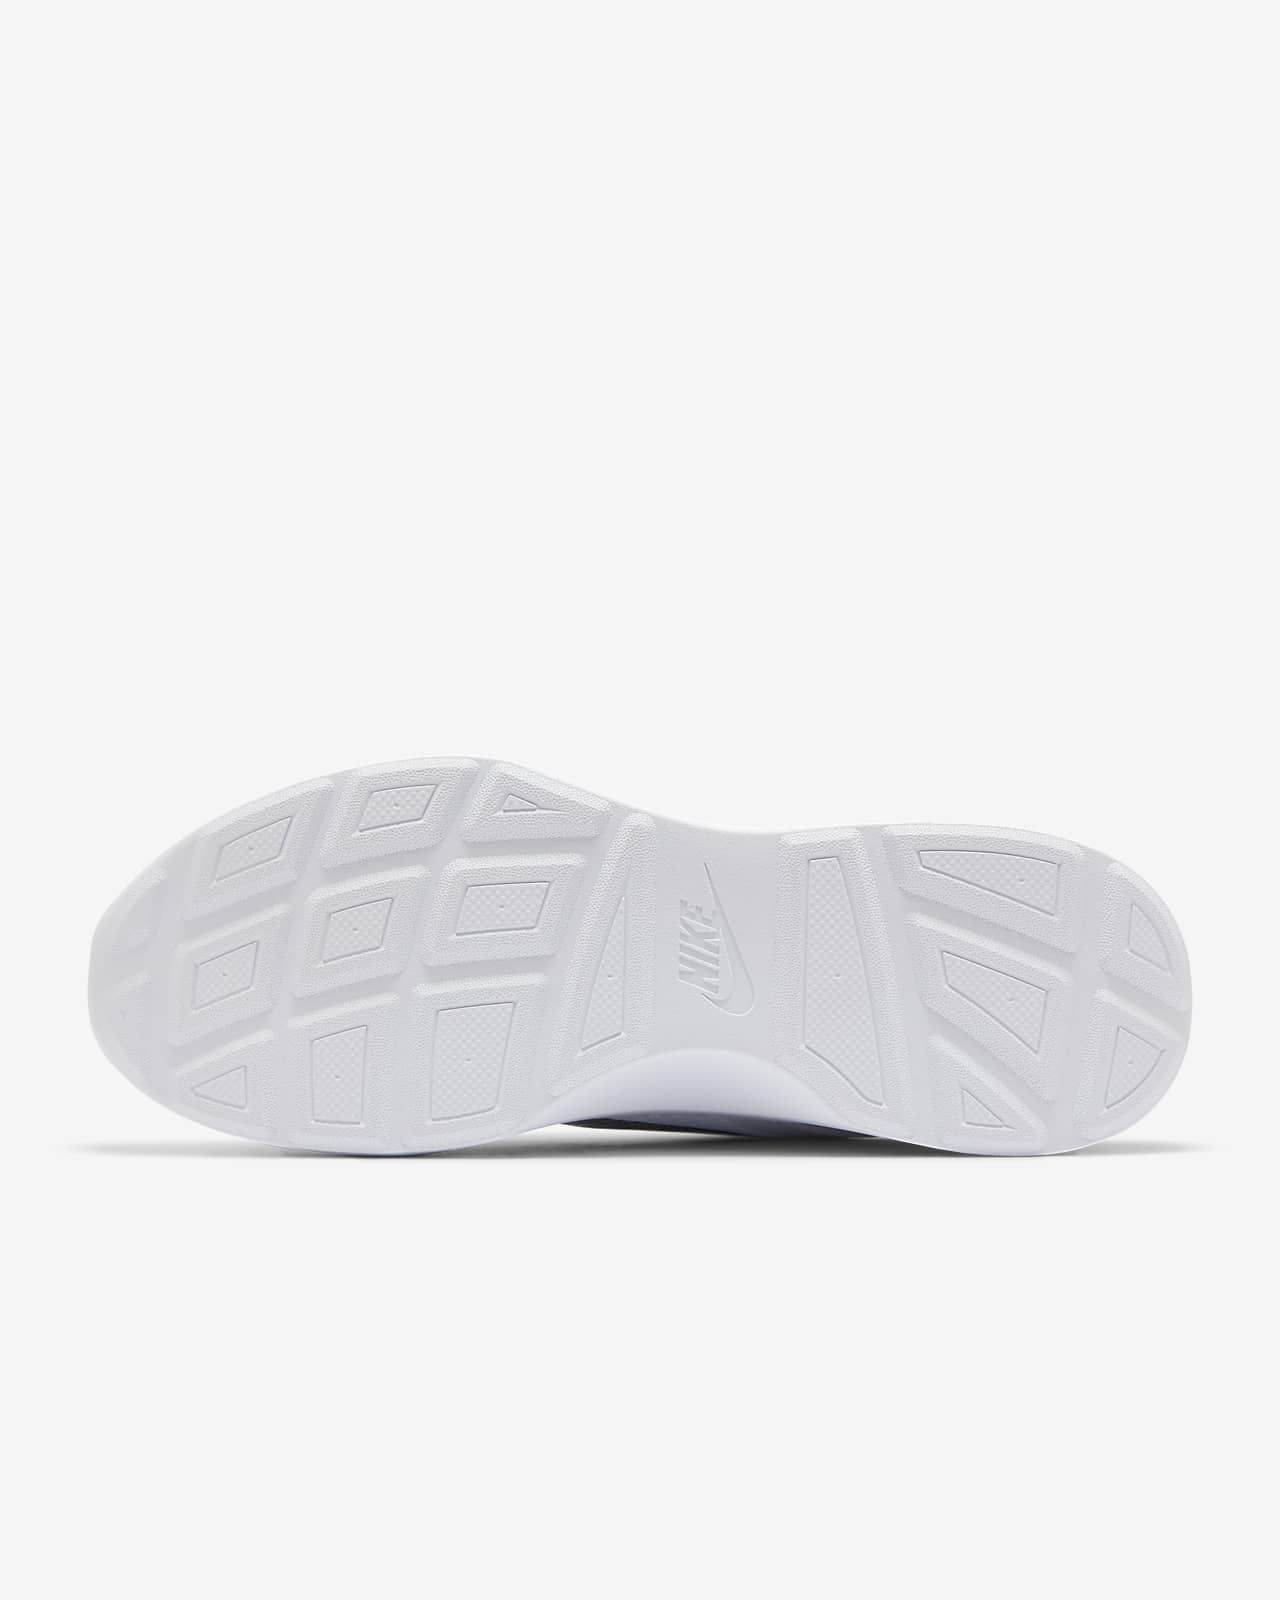 Damen Nike Sneaker weiss Explore Strada Sneaker 37,5